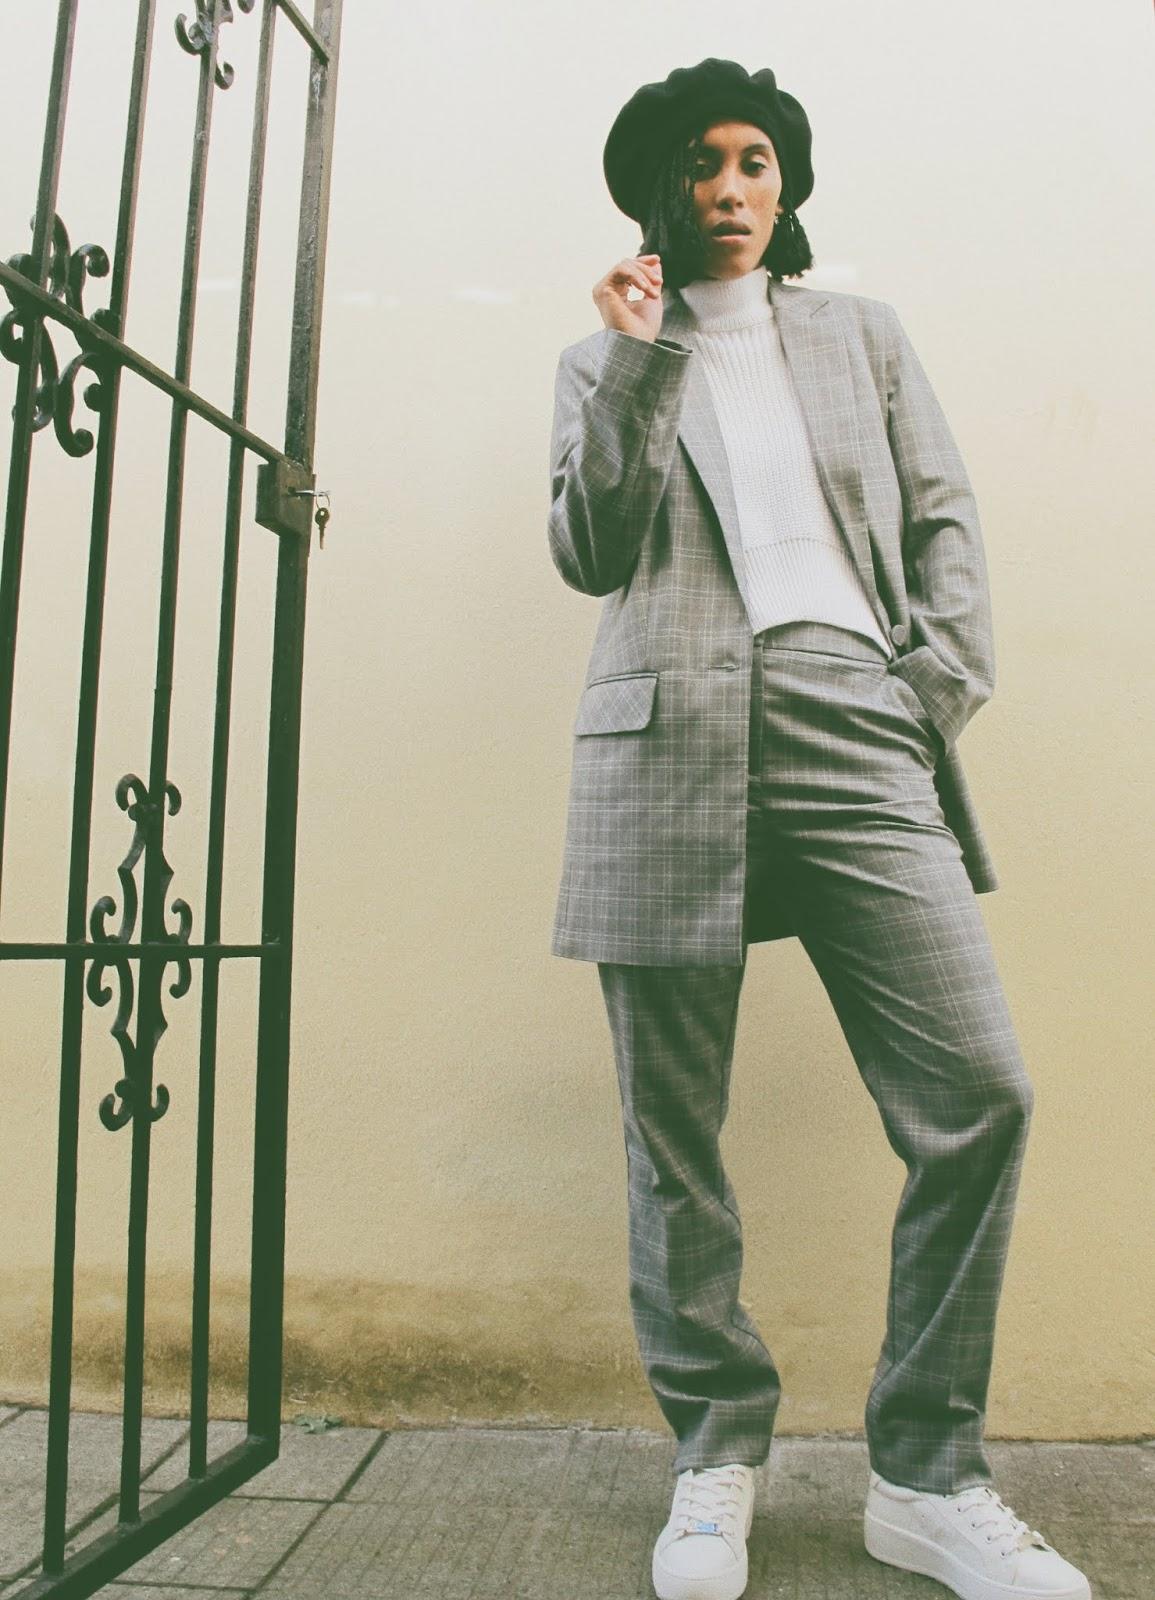 Liezel-Esquire-checked-suits